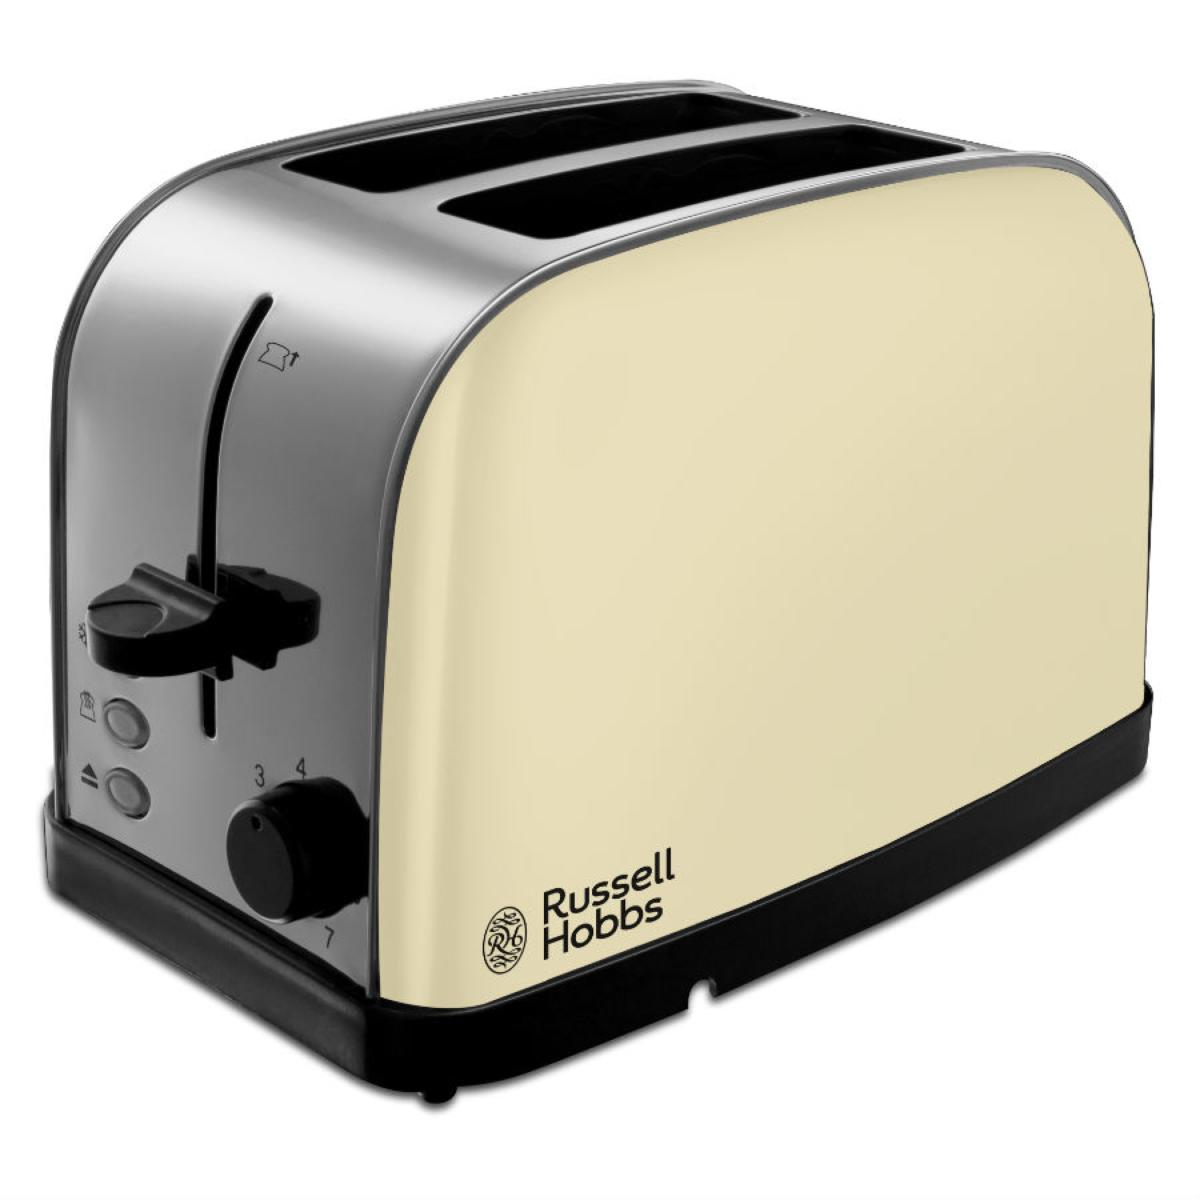 Russell Hobbs 18783 Dorchester 2-Slice Toaster - Cream